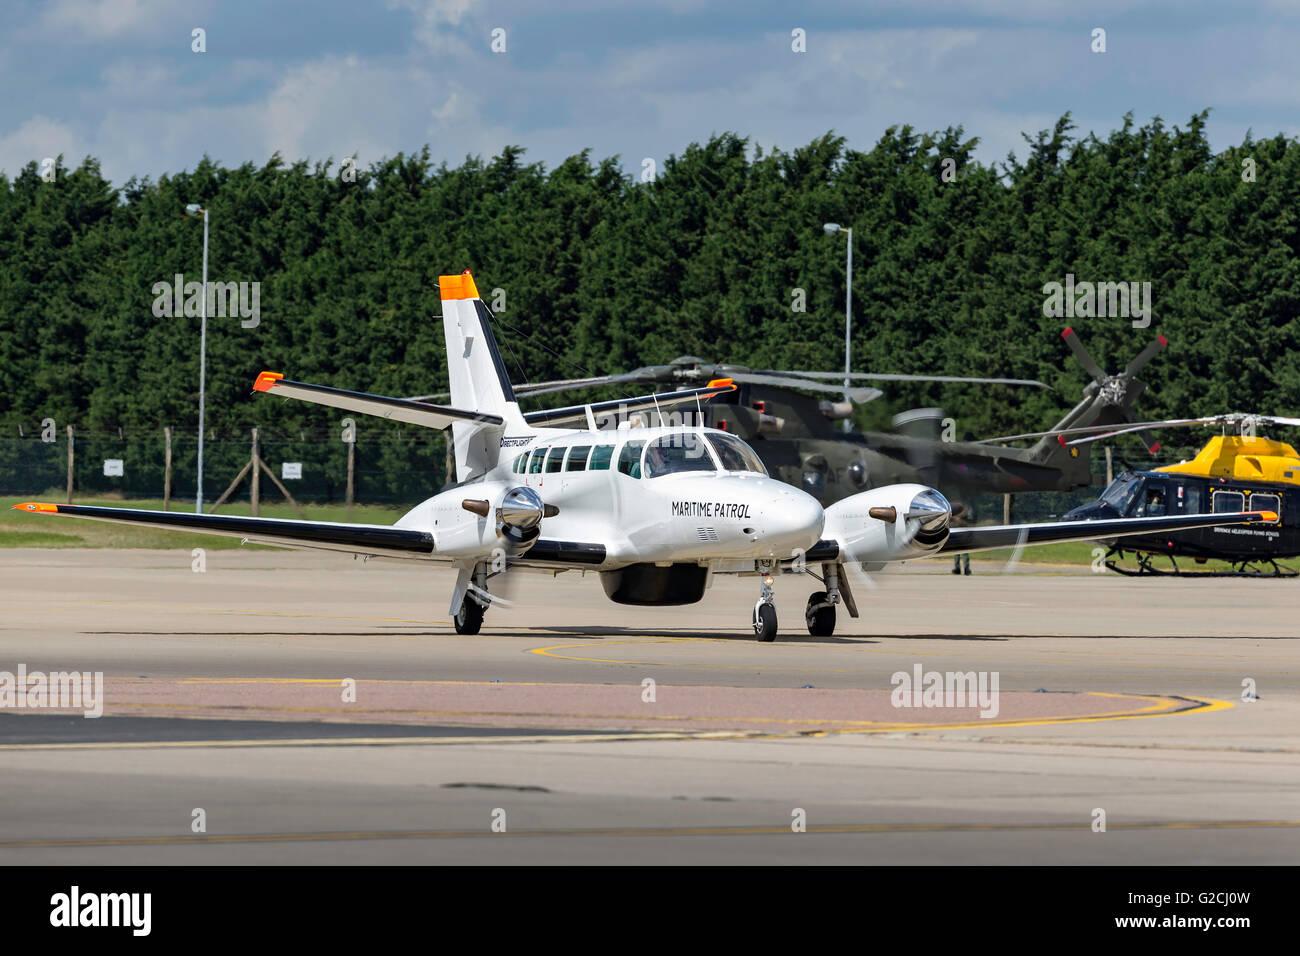 Directflight Cessna 406 (Reims F405) G-MAFB maritime patrol aircraft. - Stock Image